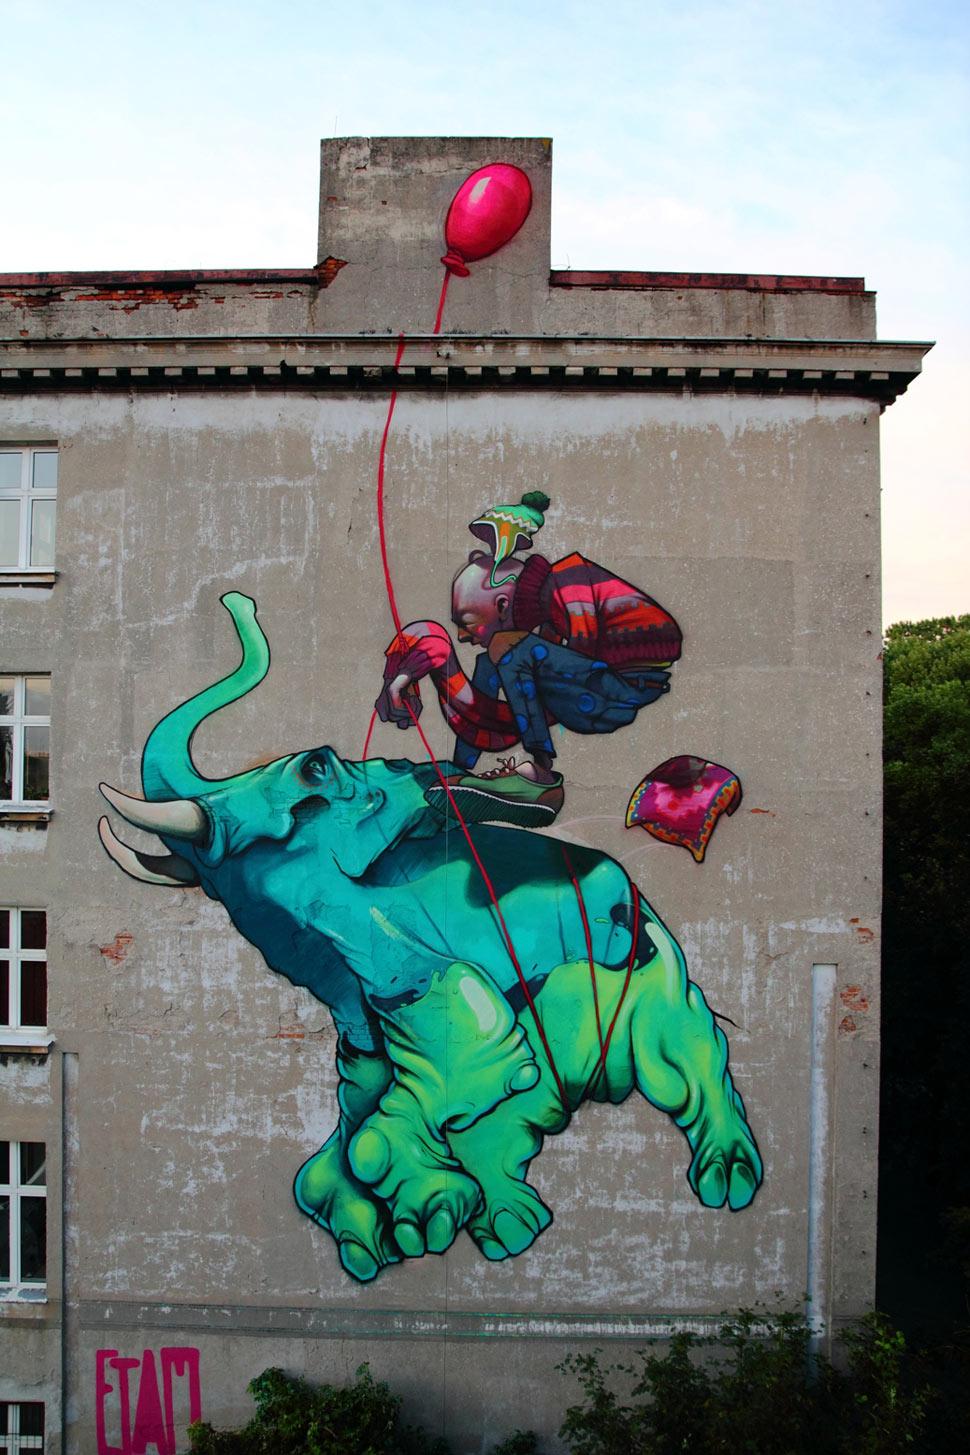 etam-cru-bezt-sainer-street-art-large-murals-04